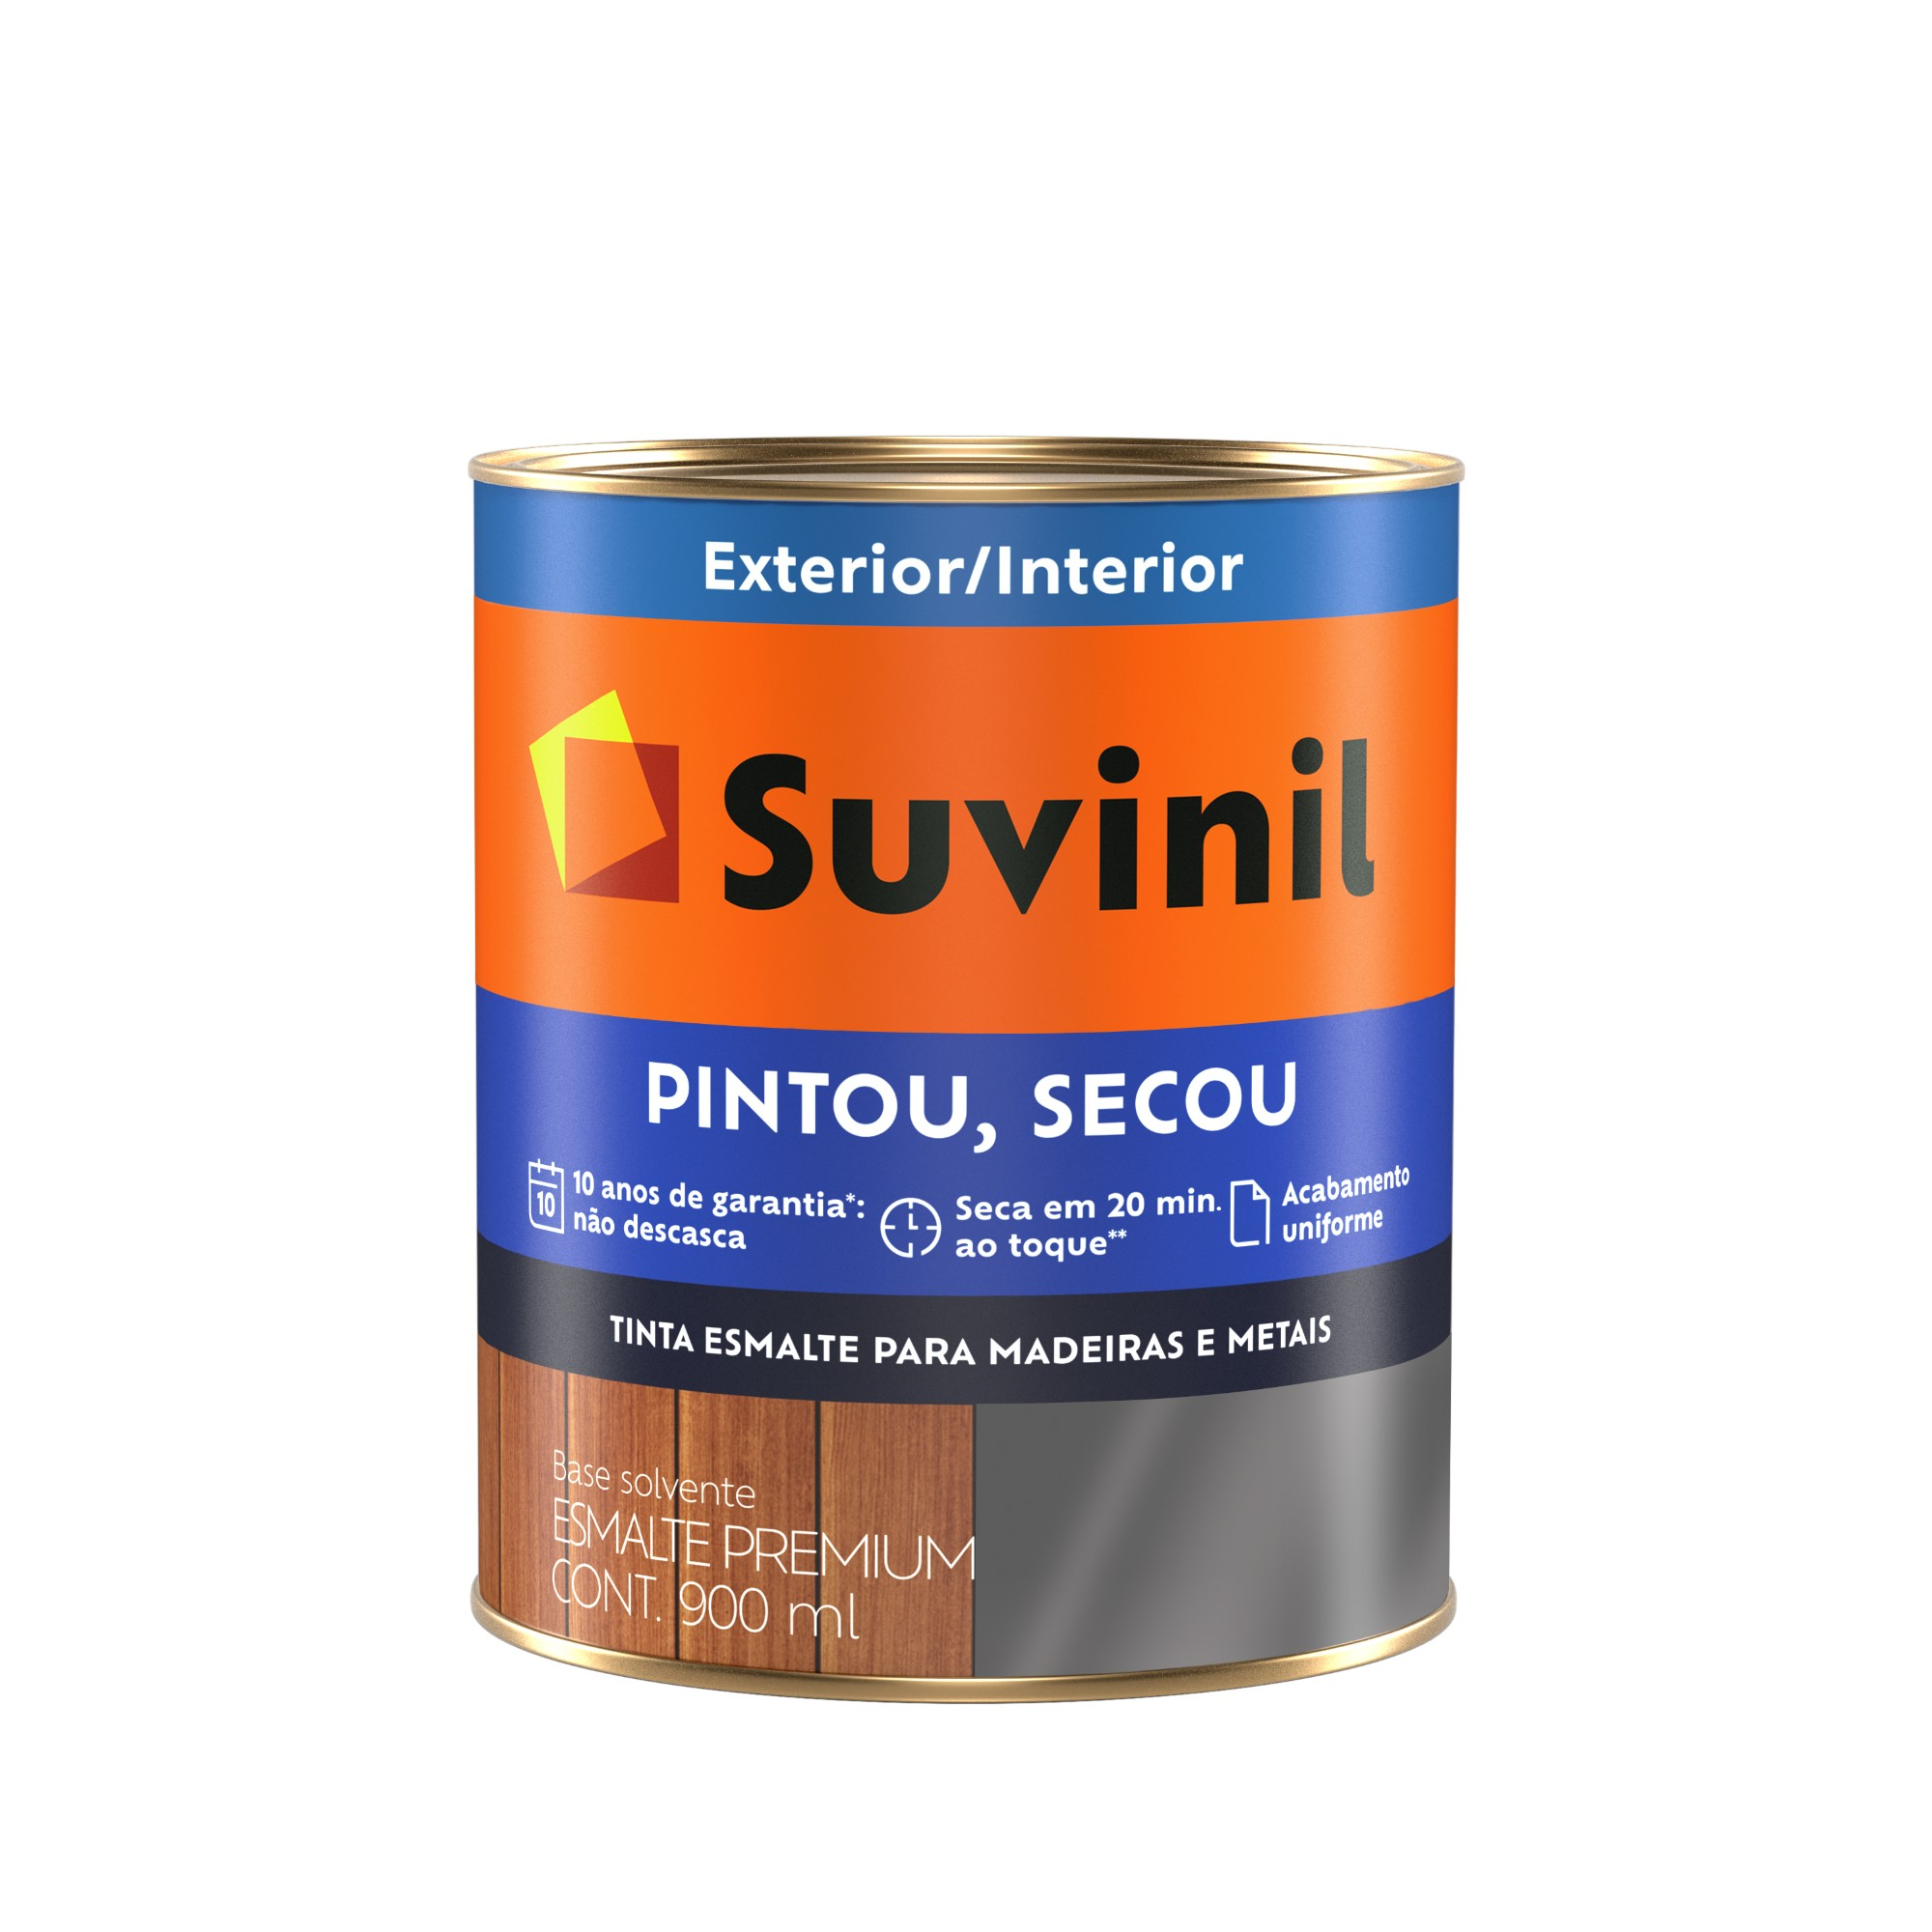 Tinta Esmalte Sintetico Brilhante Premium 09L - Gelo - Pintou Secou Suvinil